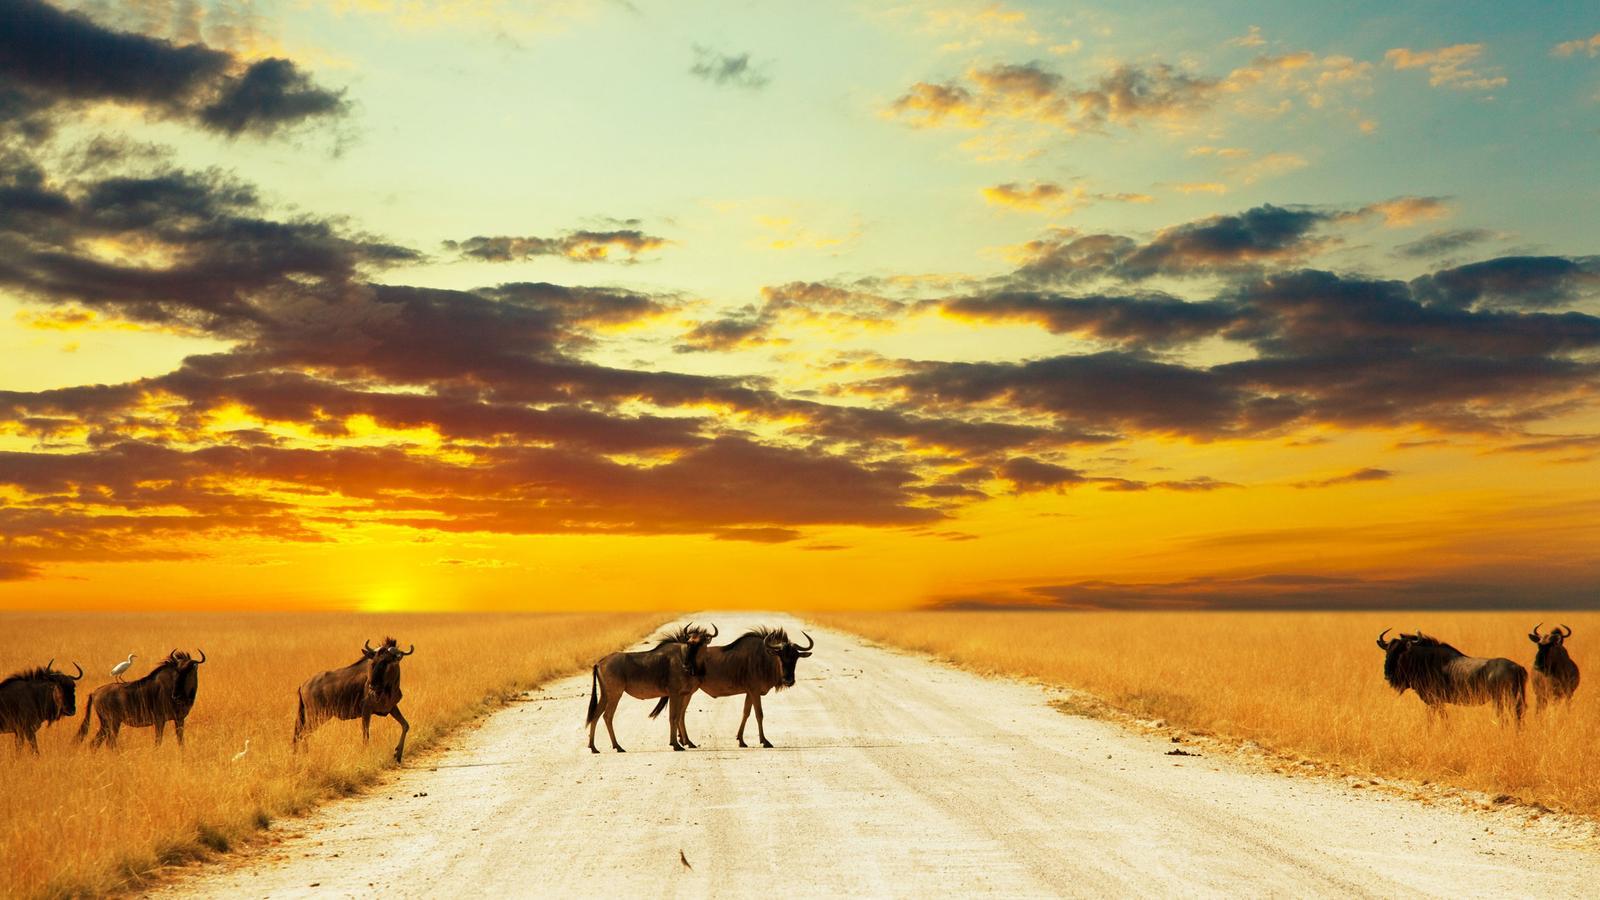 Afrika allumfassend traveljunkies.tours